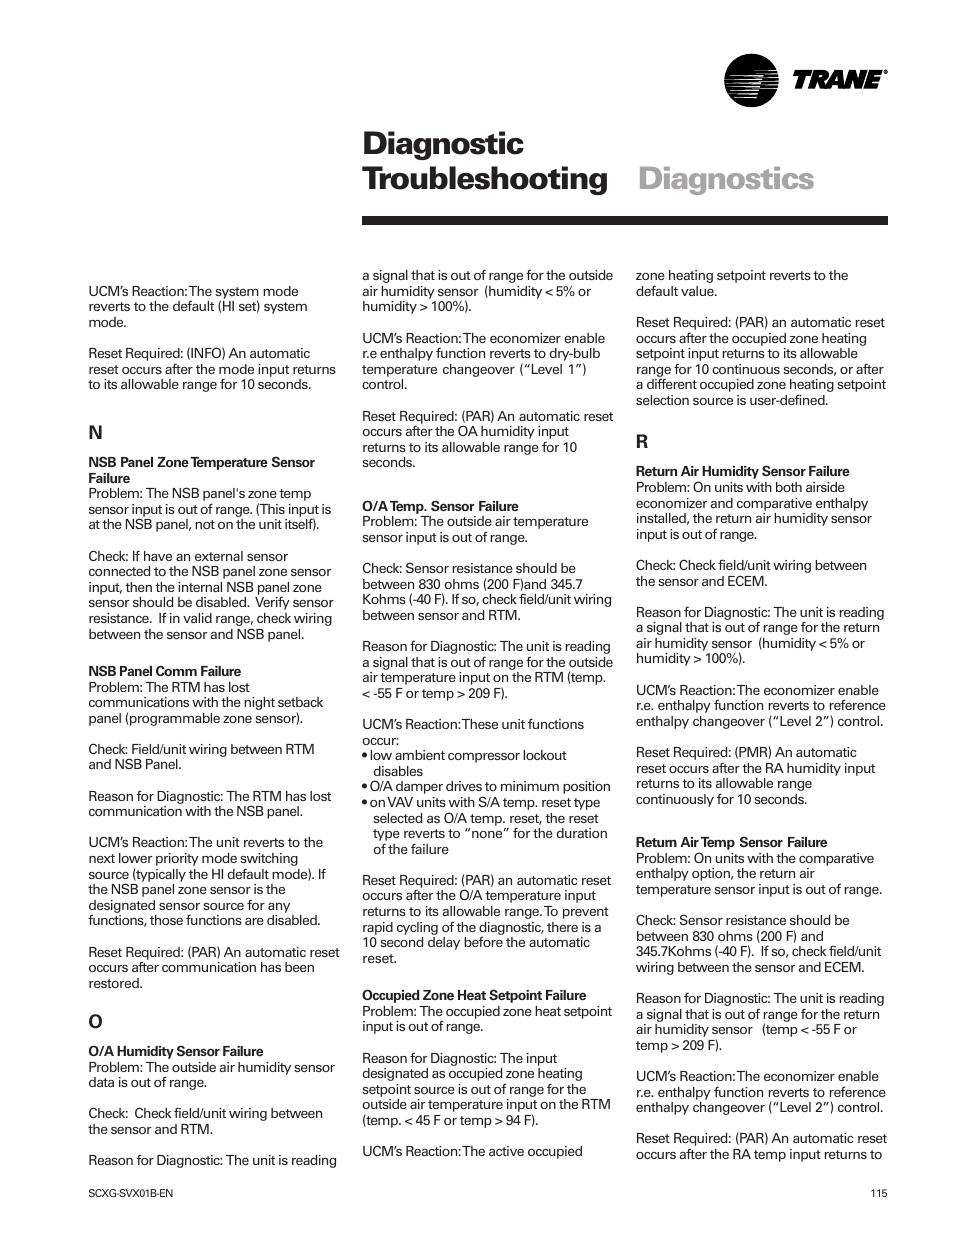 diagnostic troubleshooting diagnostics trane intellipak scwg 020 rh manualsdir com DSM-5 Hardcover DSM to the Scientific Basis